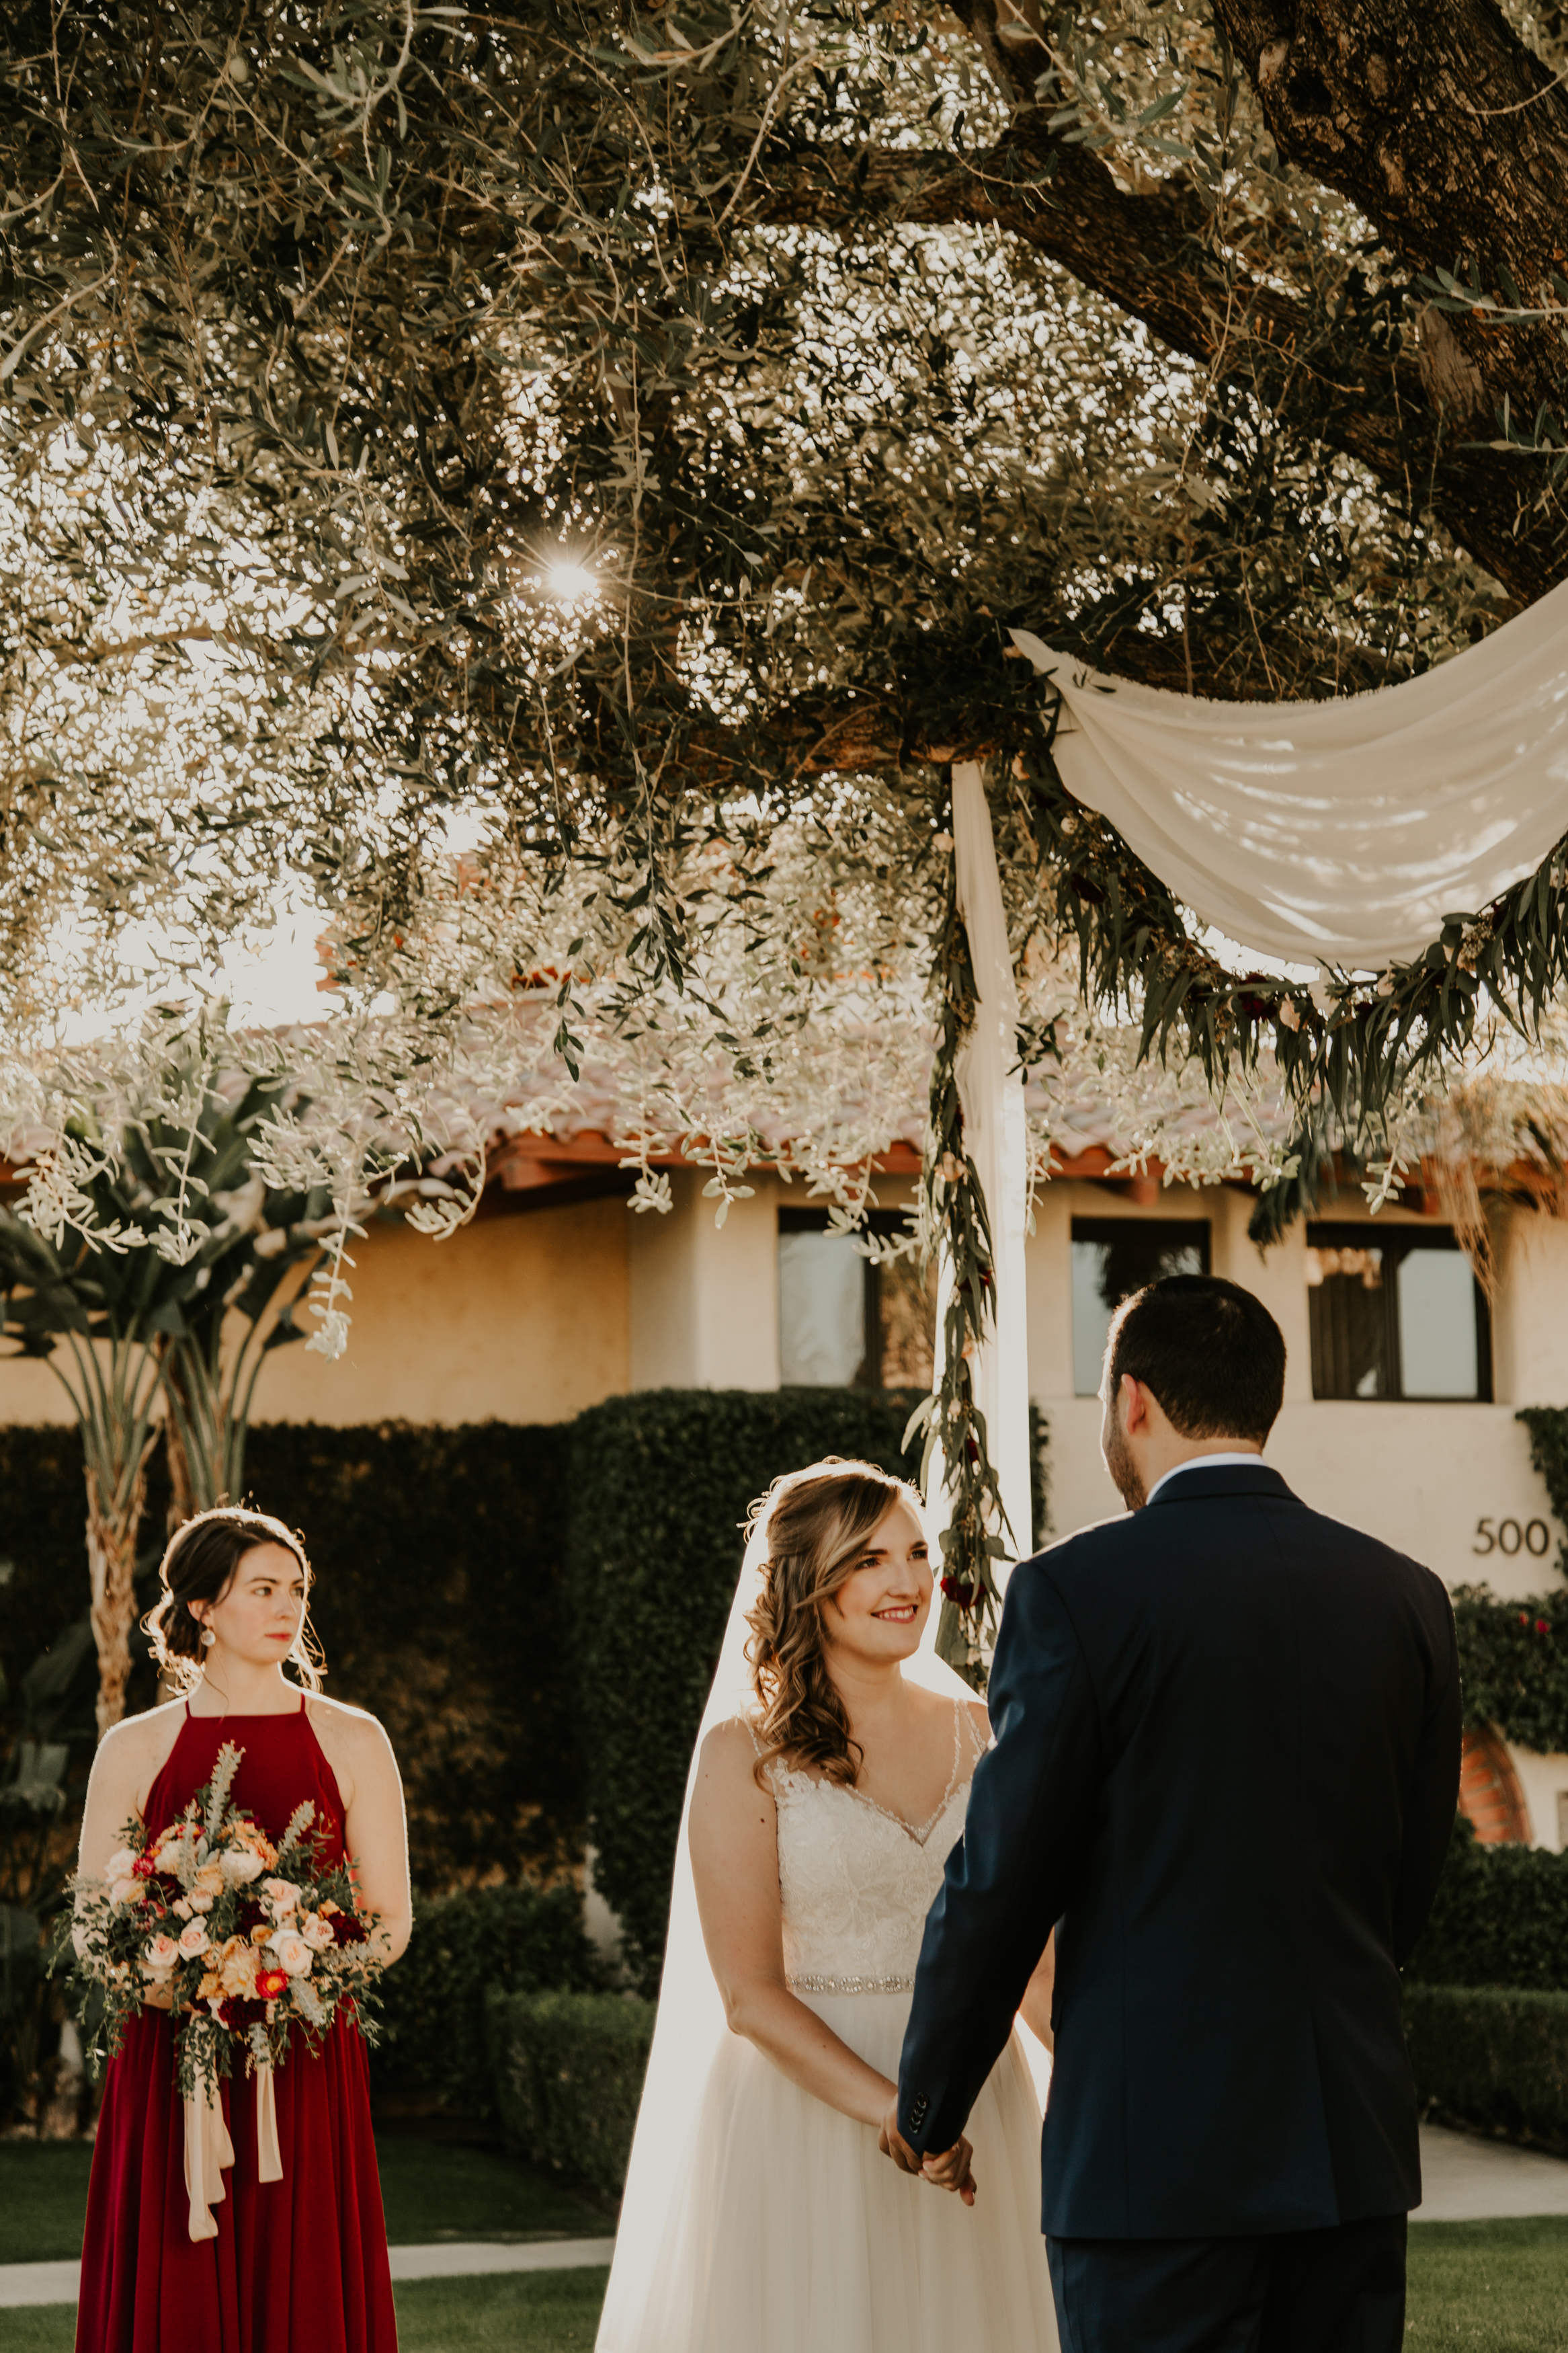 Dusty_Pink_Wedding_Florals_Sibyl_Sophia_Ceremony.jpg